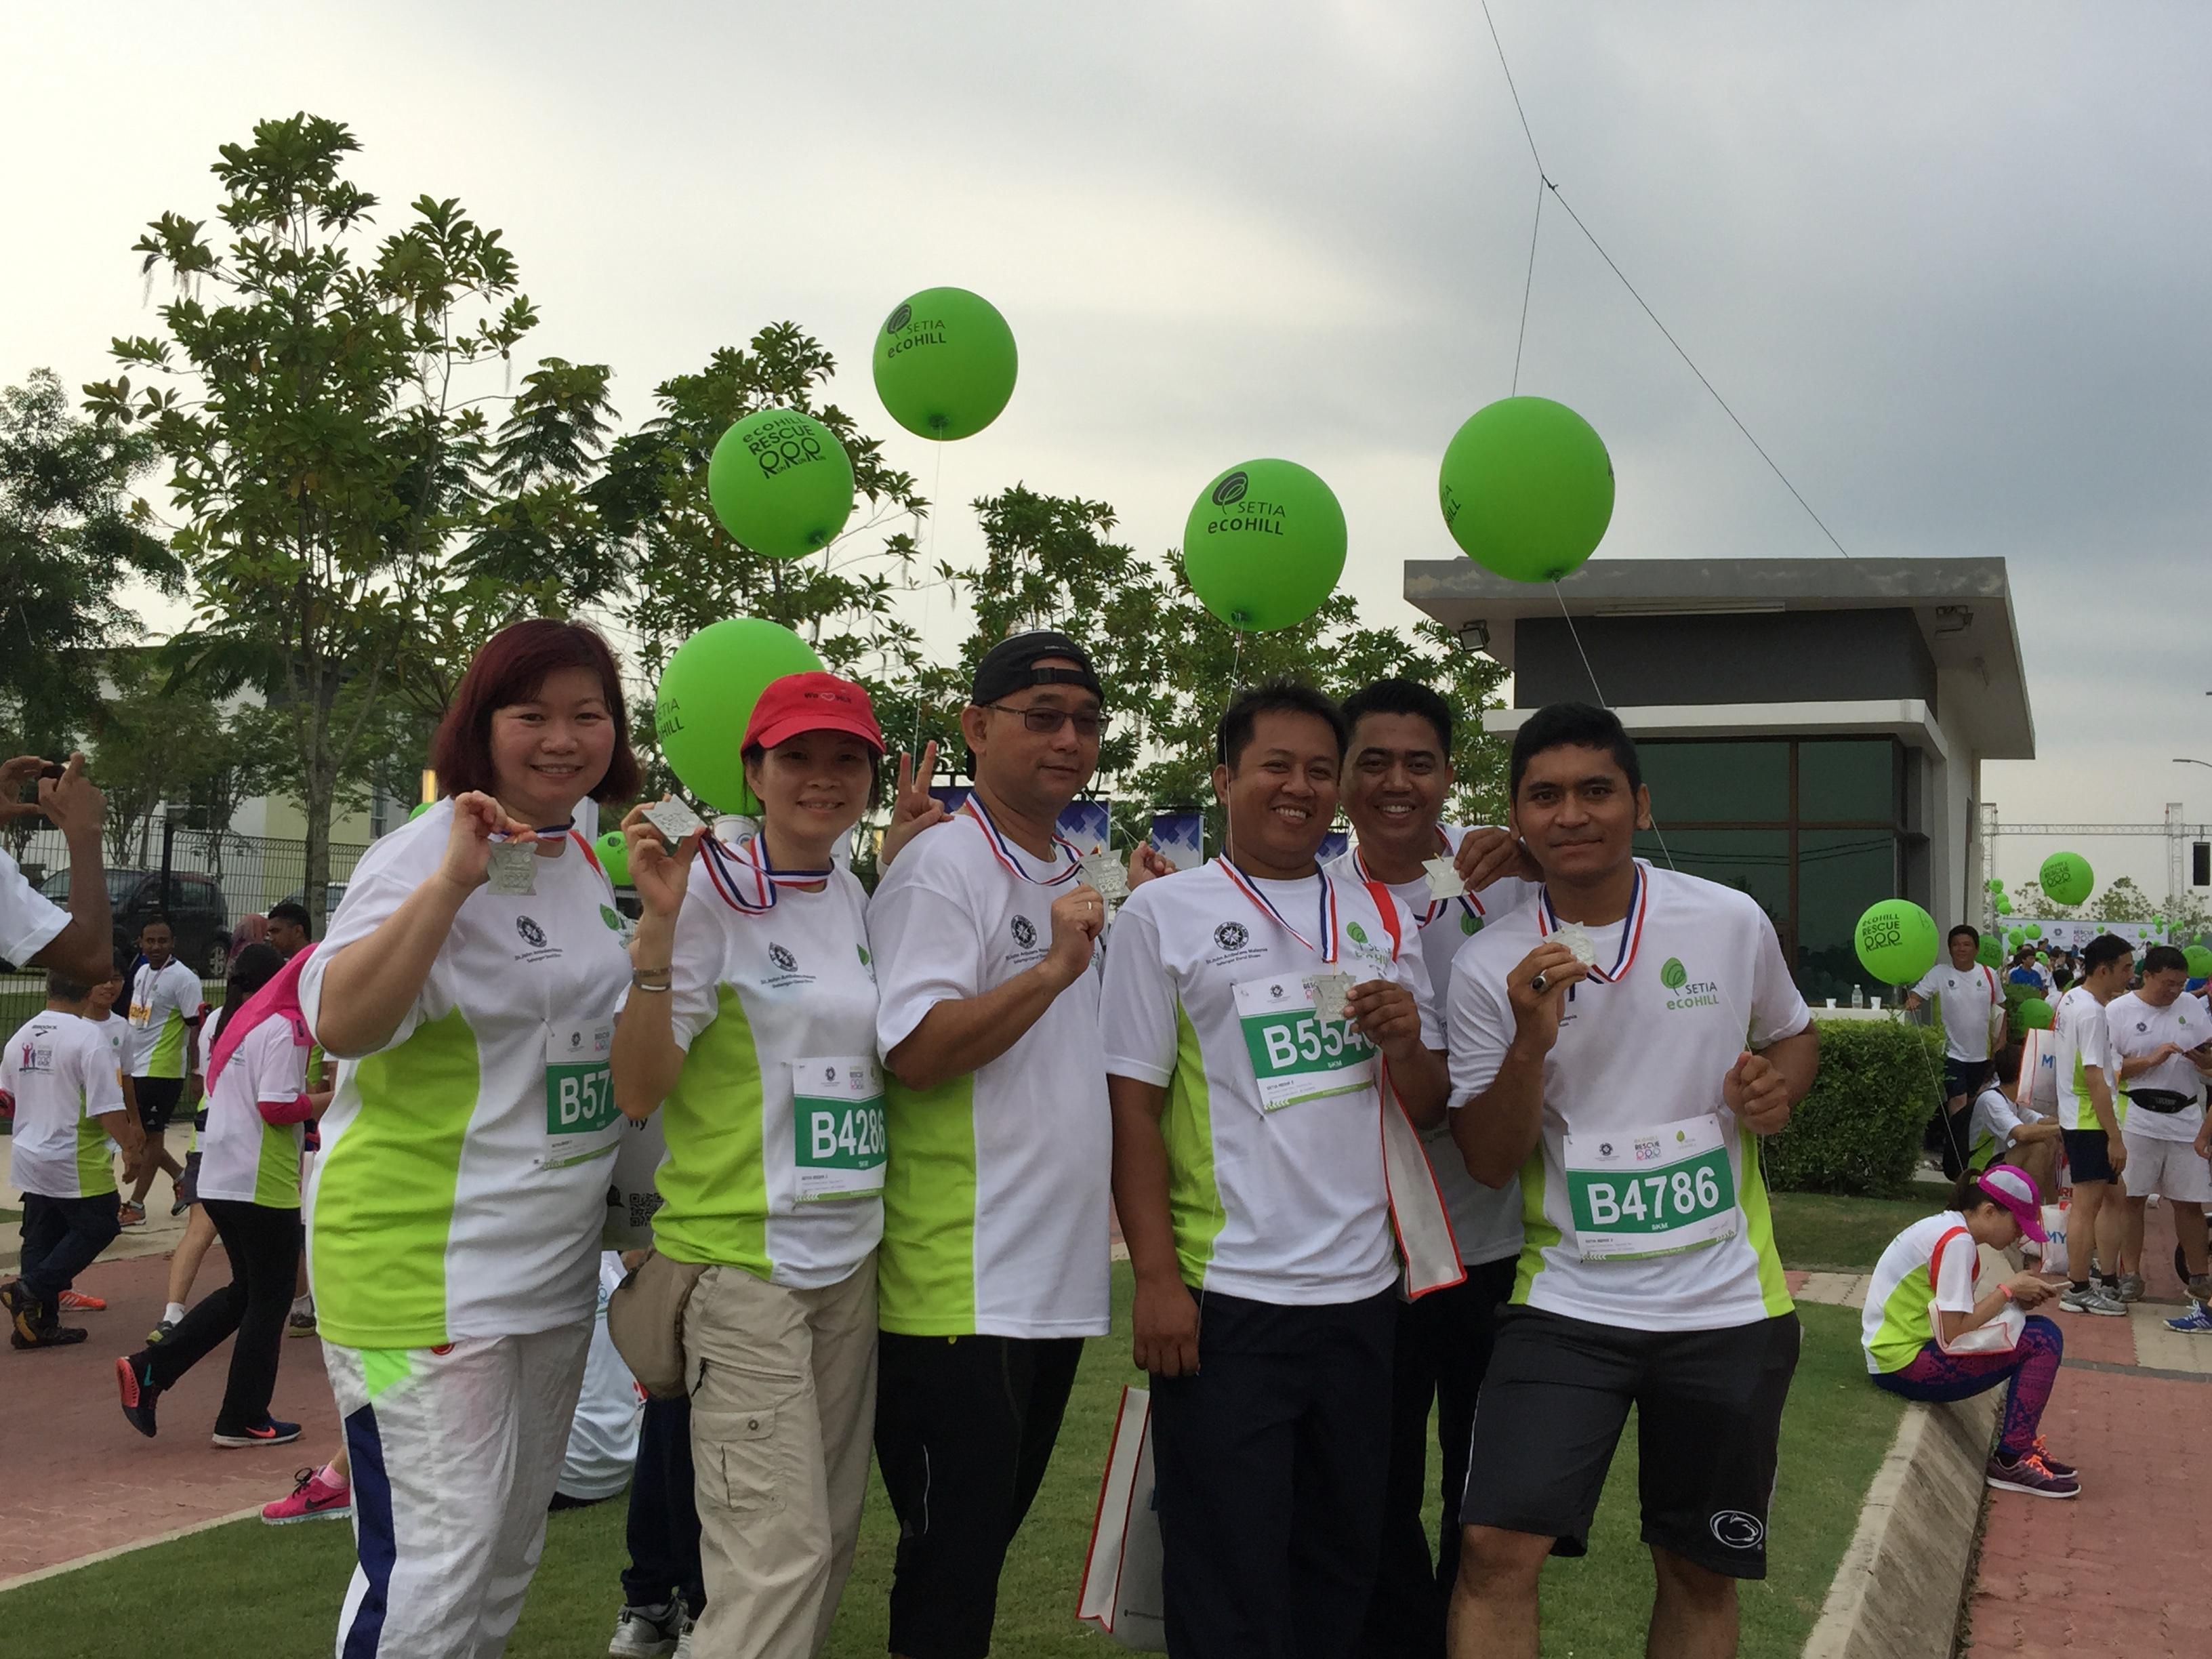 Charity rescue run at Setia EcoHill